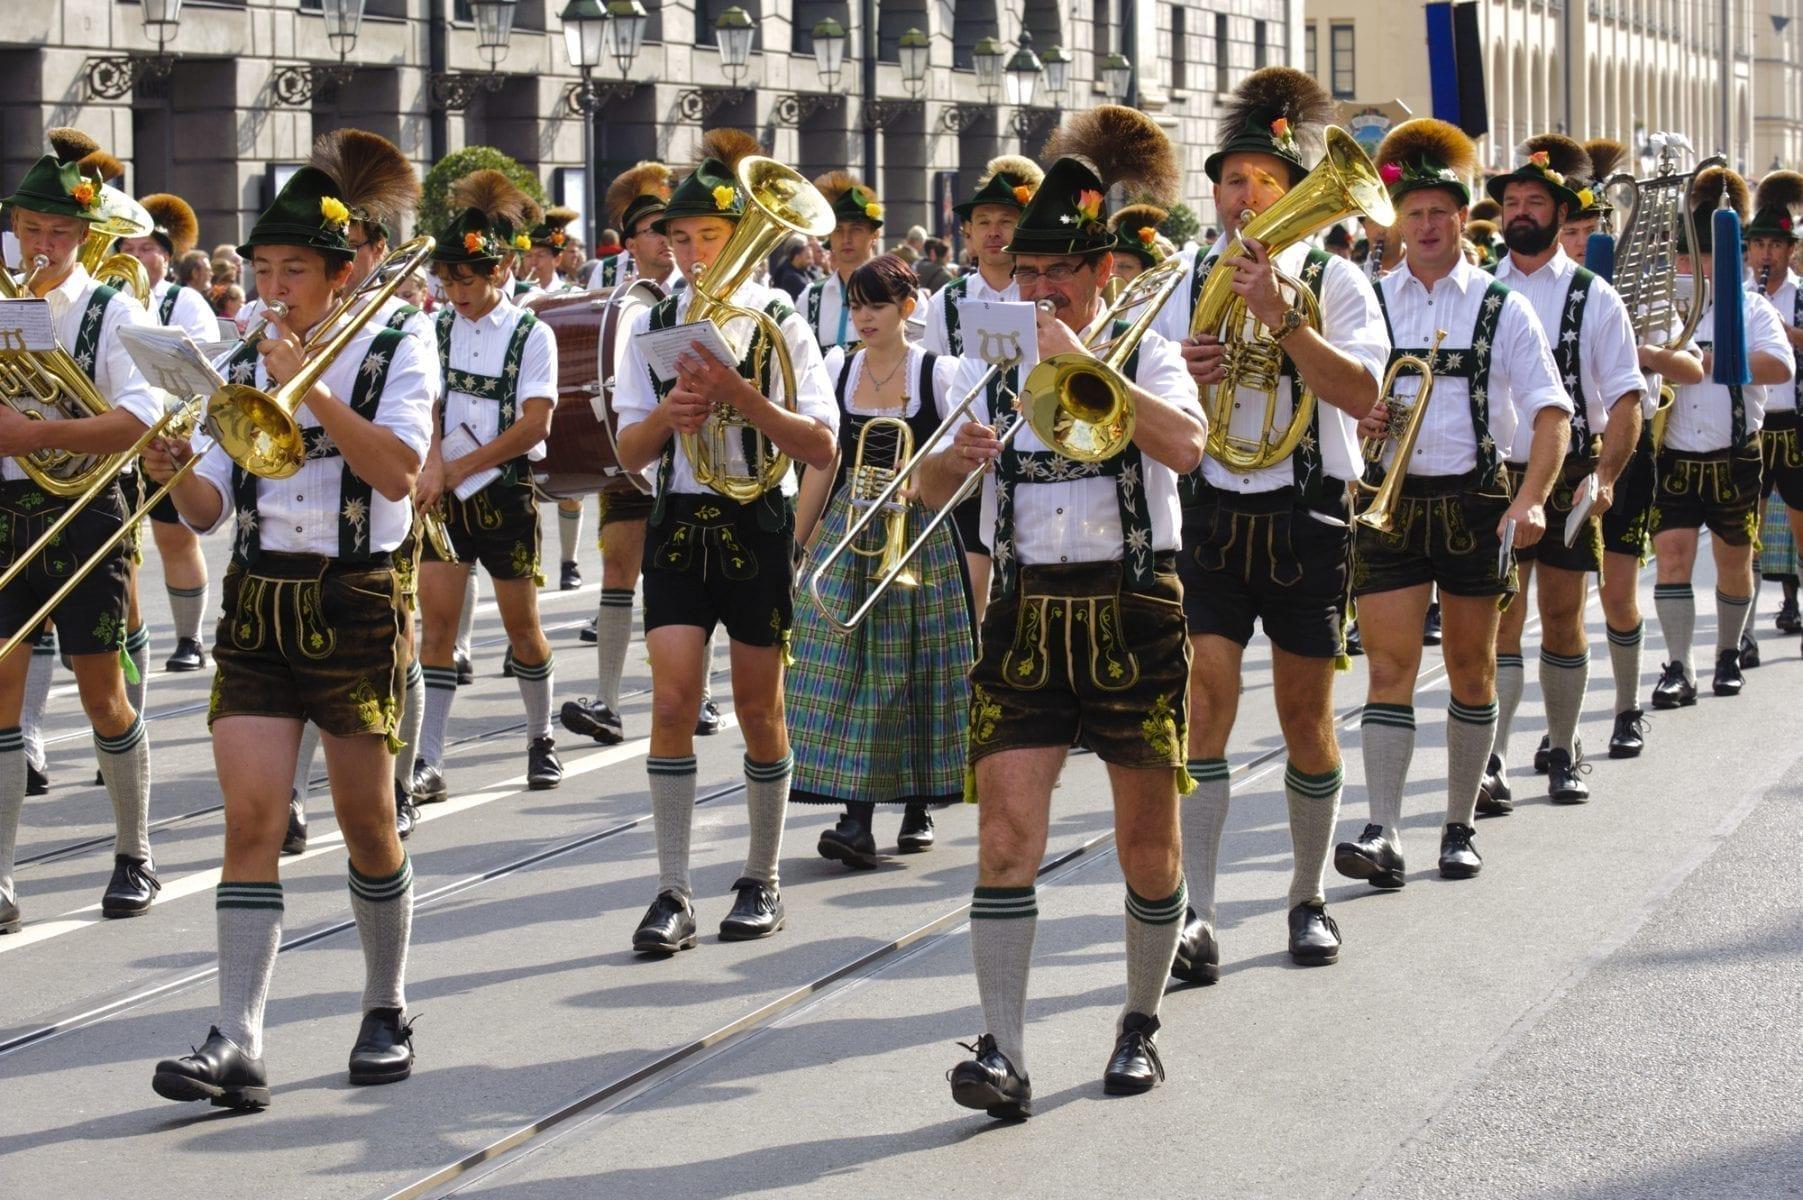 Top Oktoberfest Songs You WILL Hear at German Festivals